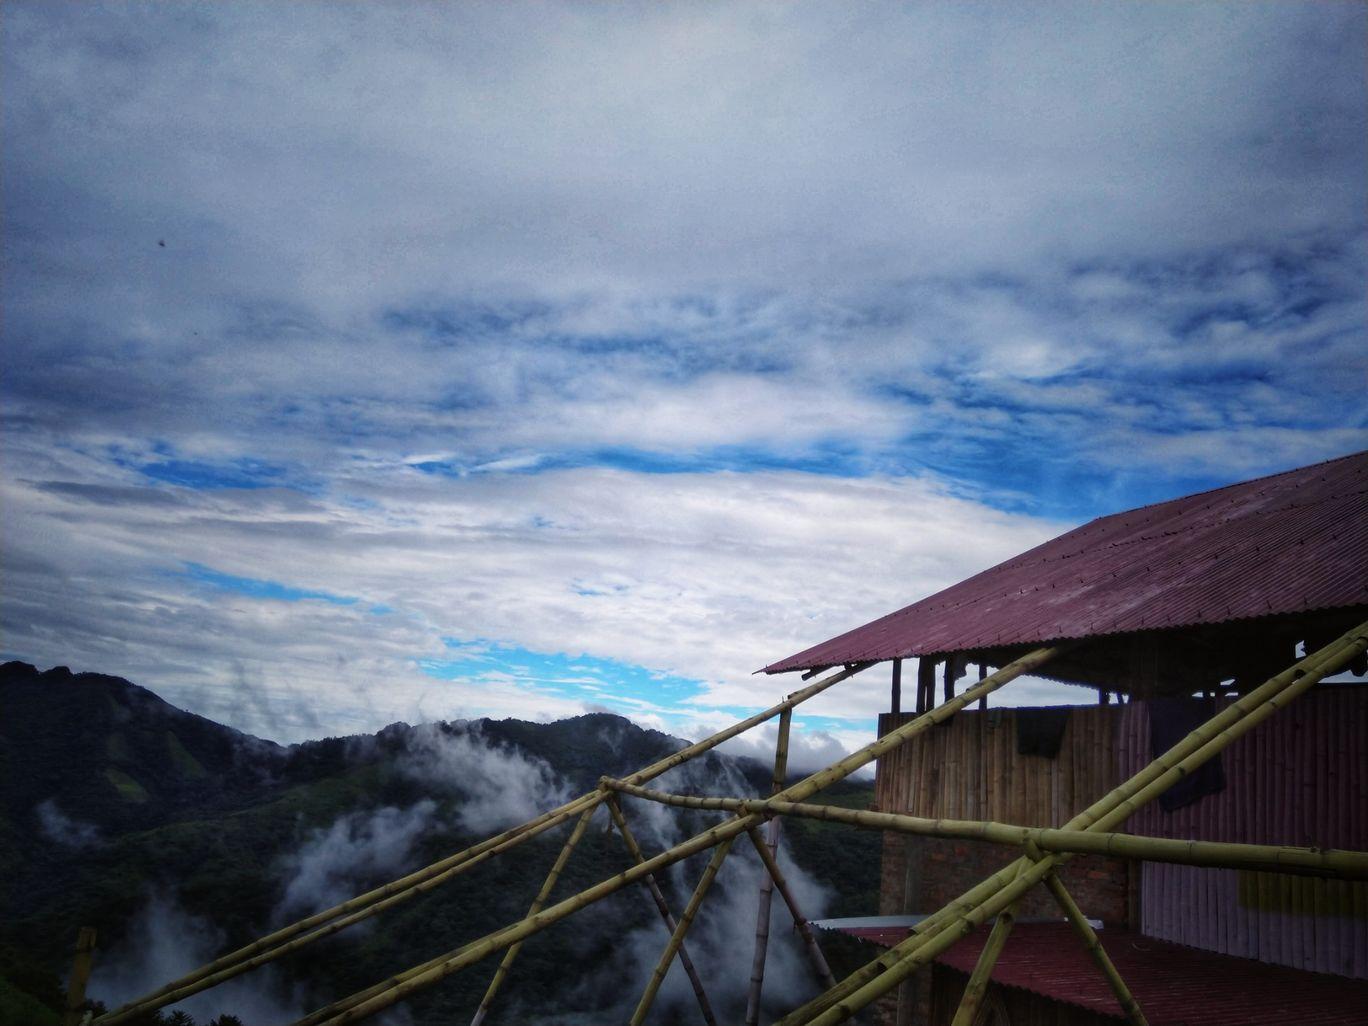 Photo of Tuensang district By deepshikha gautam